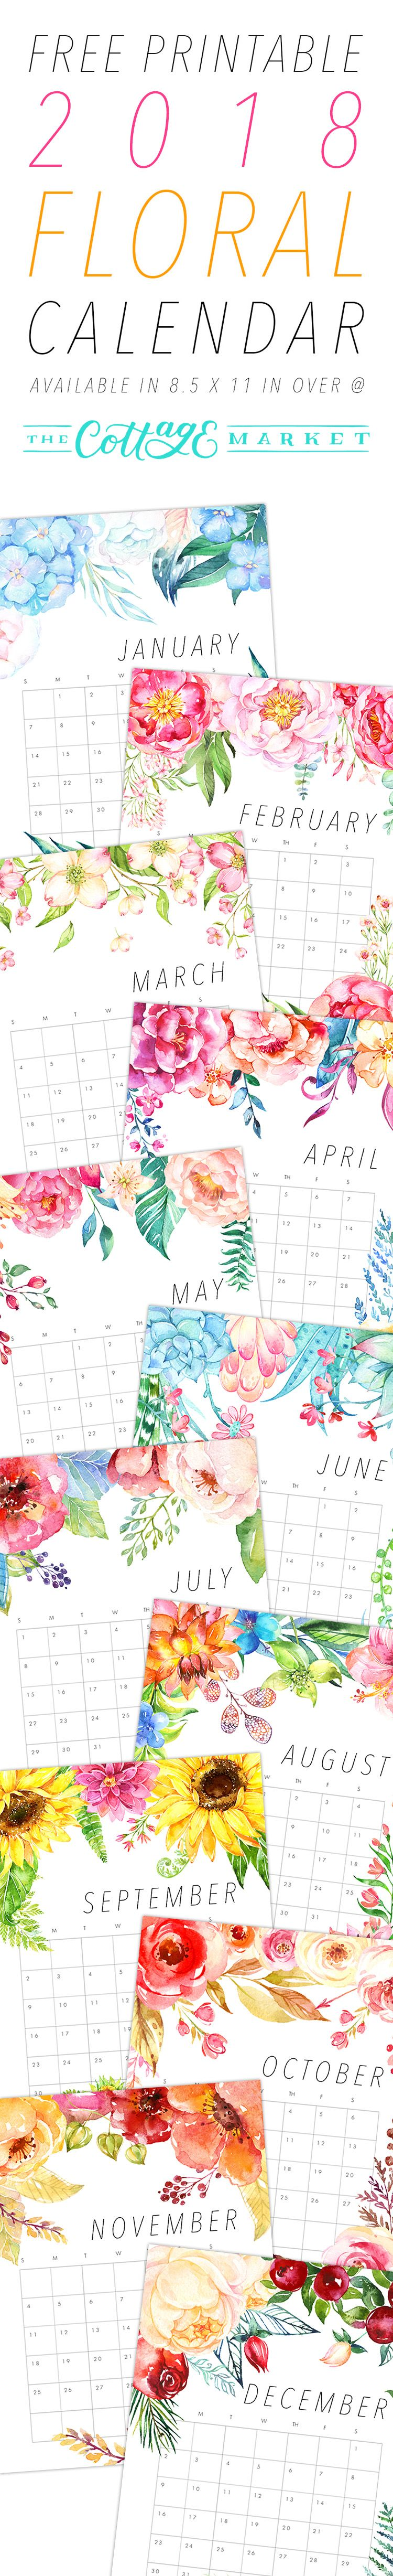 2017 Free Printable Calendar Fabulous Freebies Pinterest